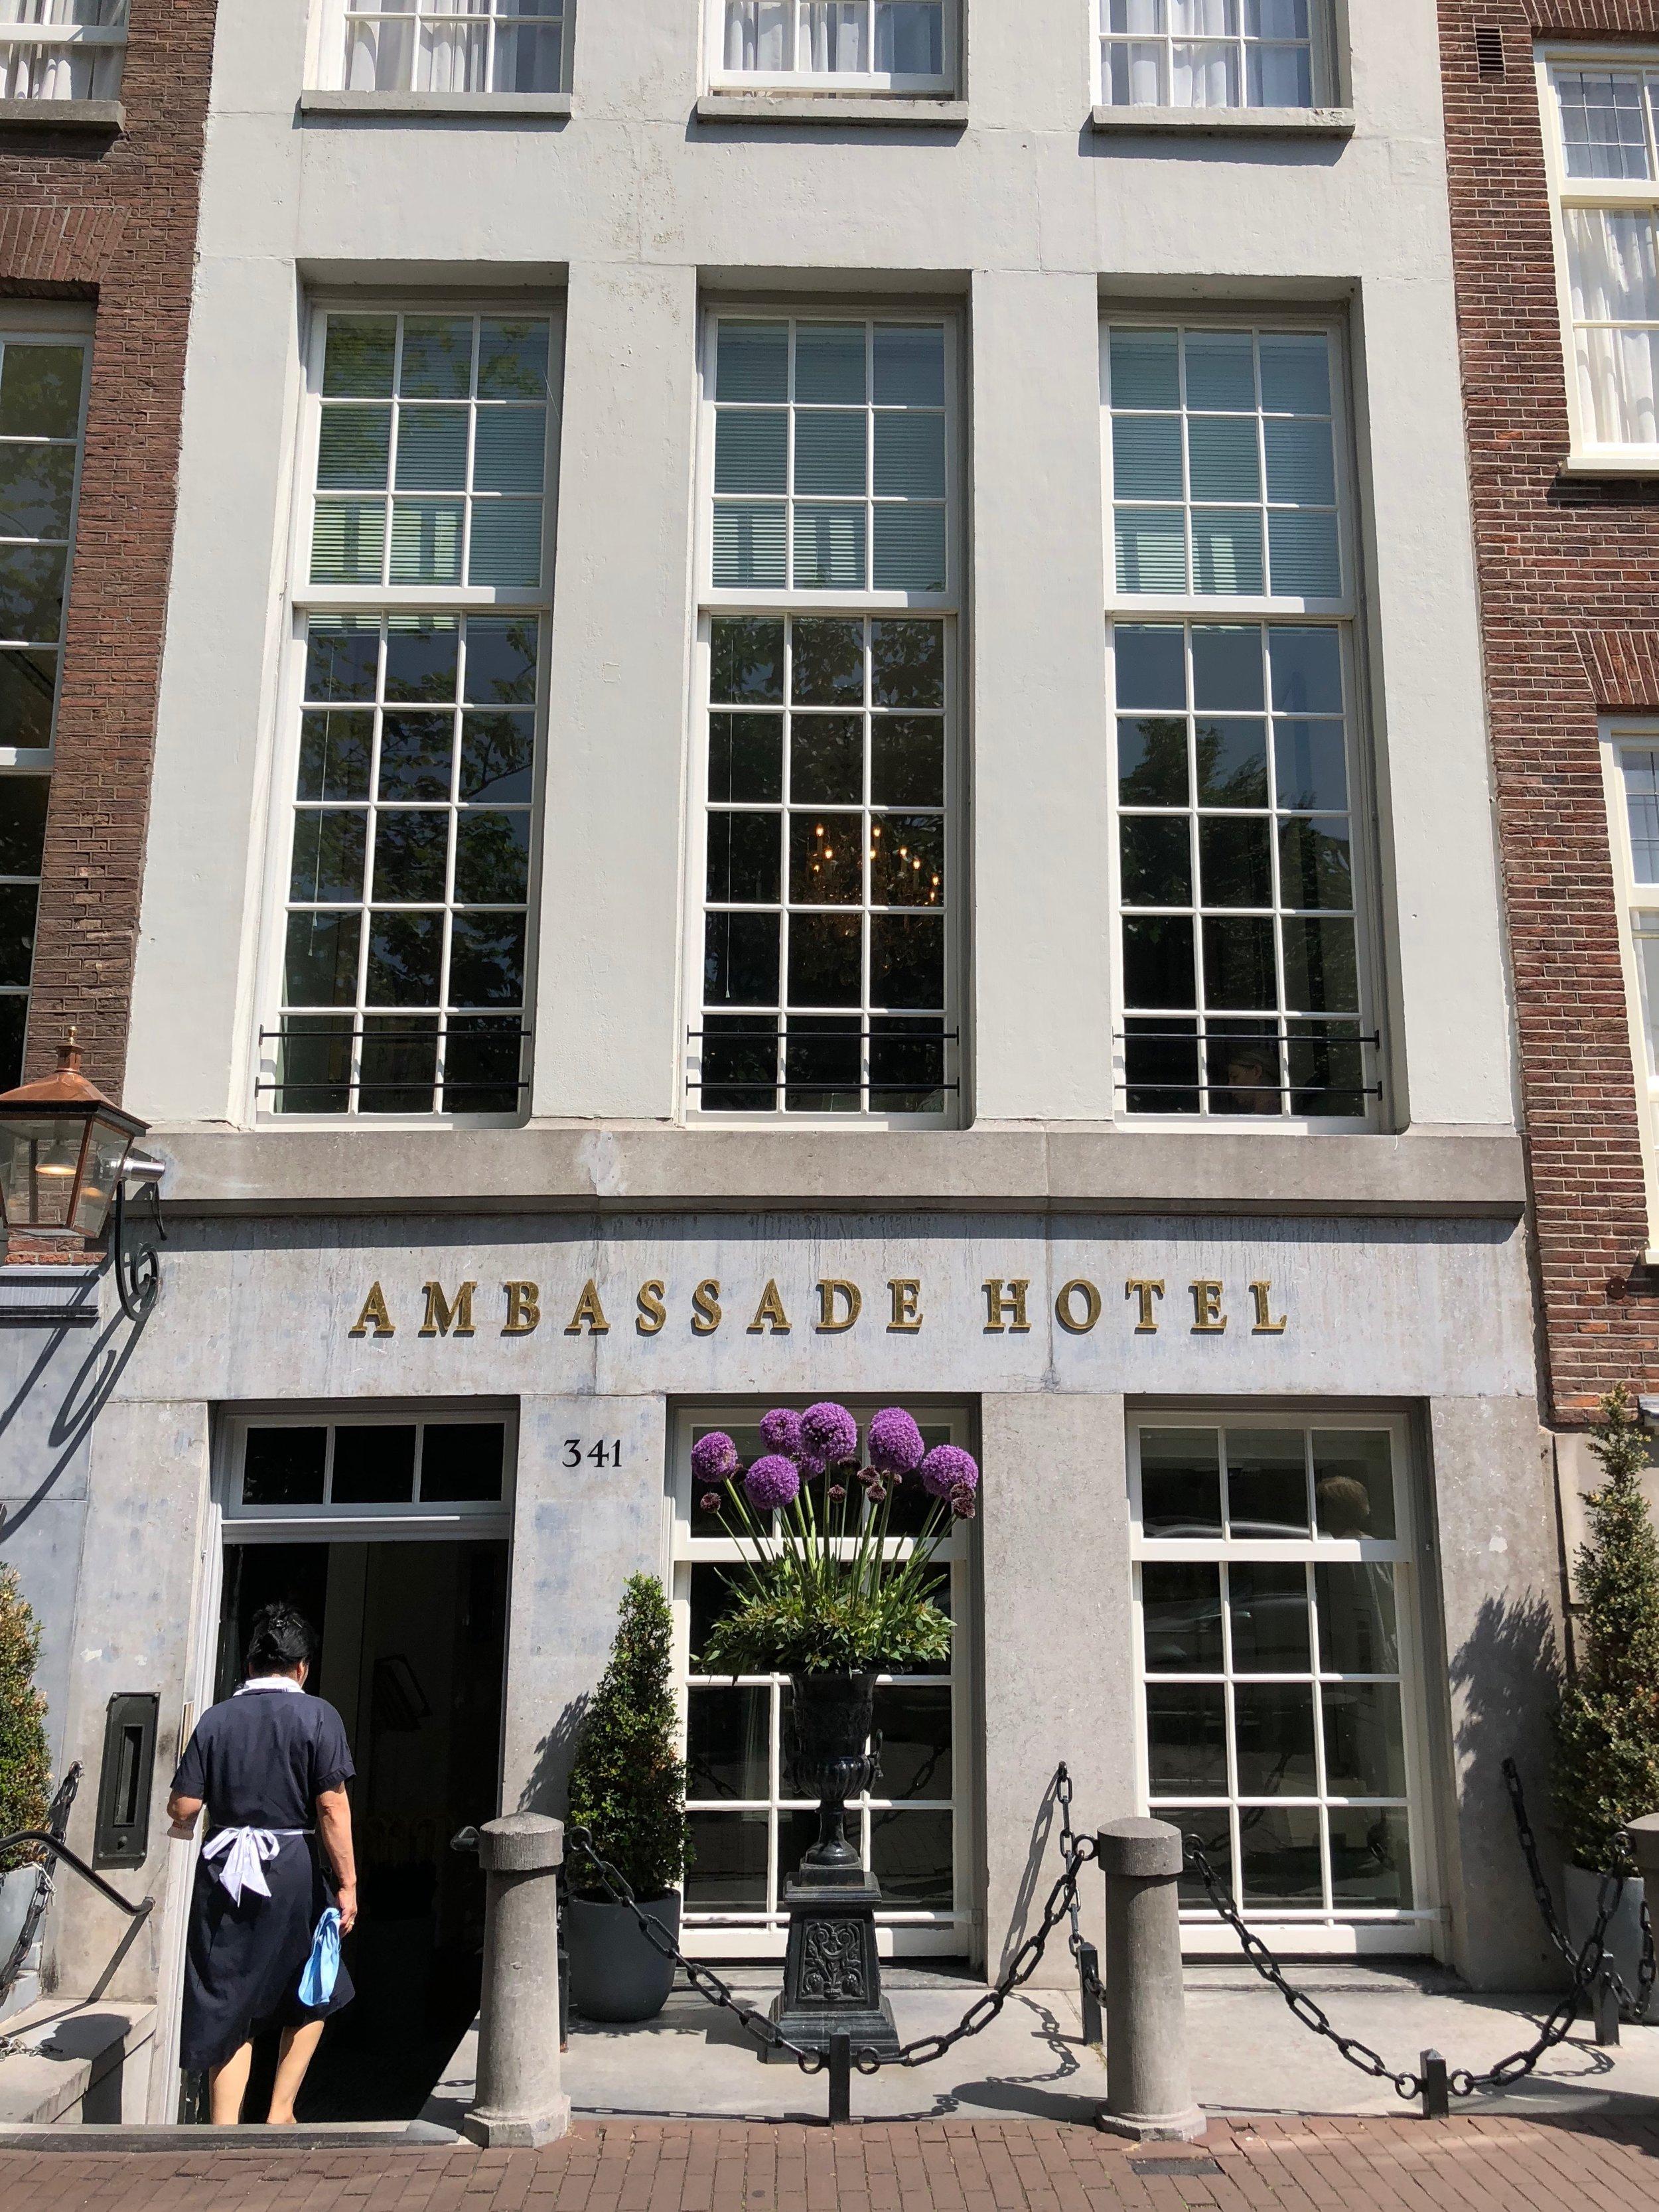 The Ambassade Hotel, Amsterdam